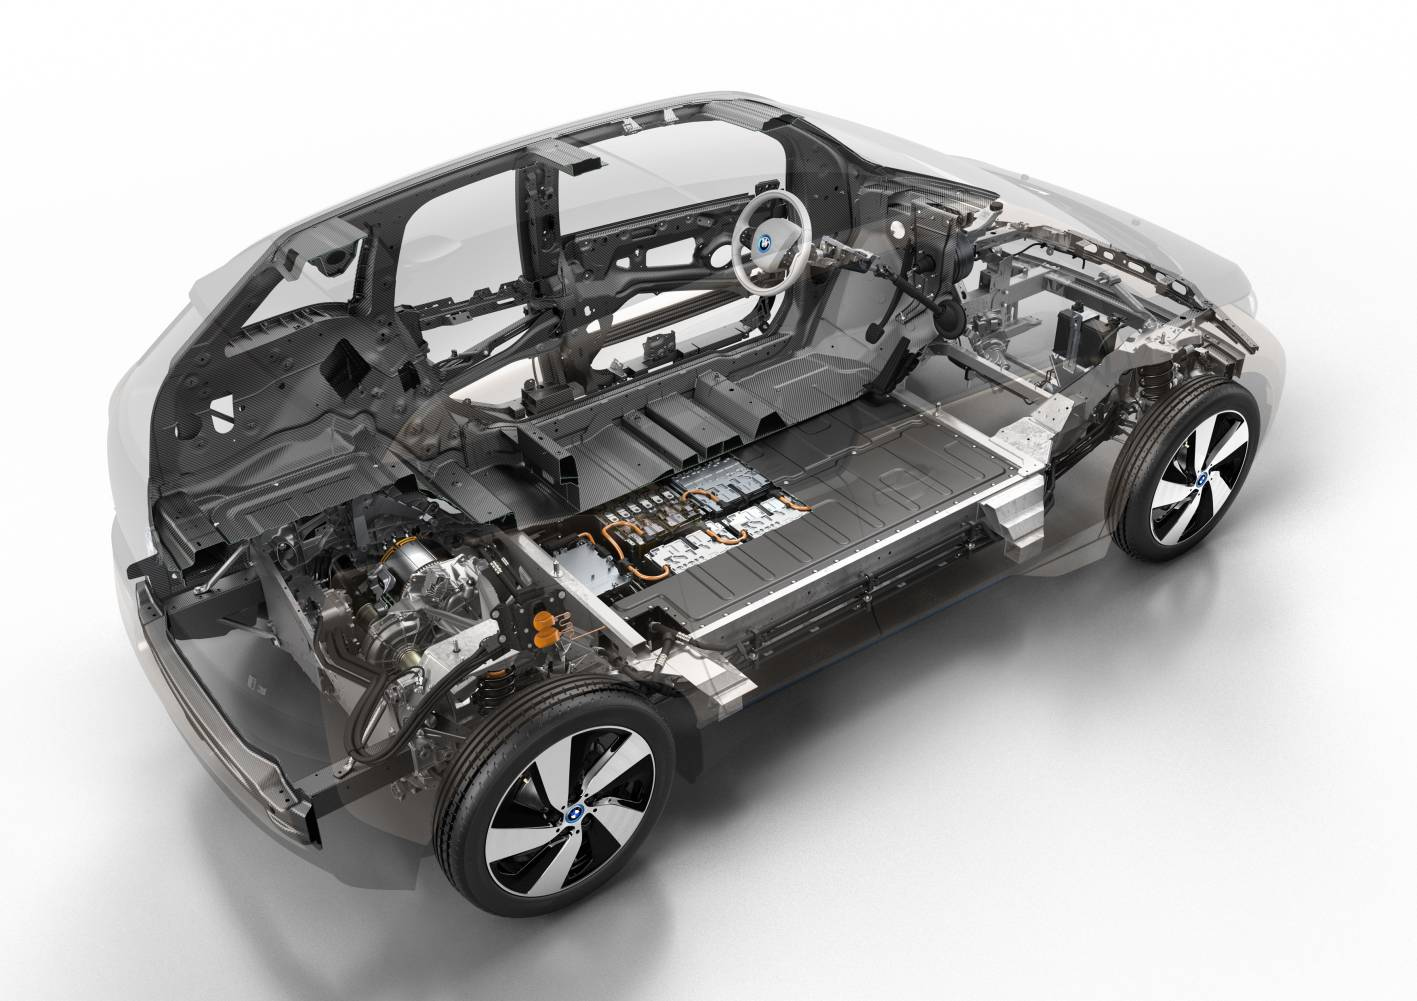 bmw cars news i3 bmw 39 s first electric car. Black Bedroom Furniture Sets. Home Design Ideas